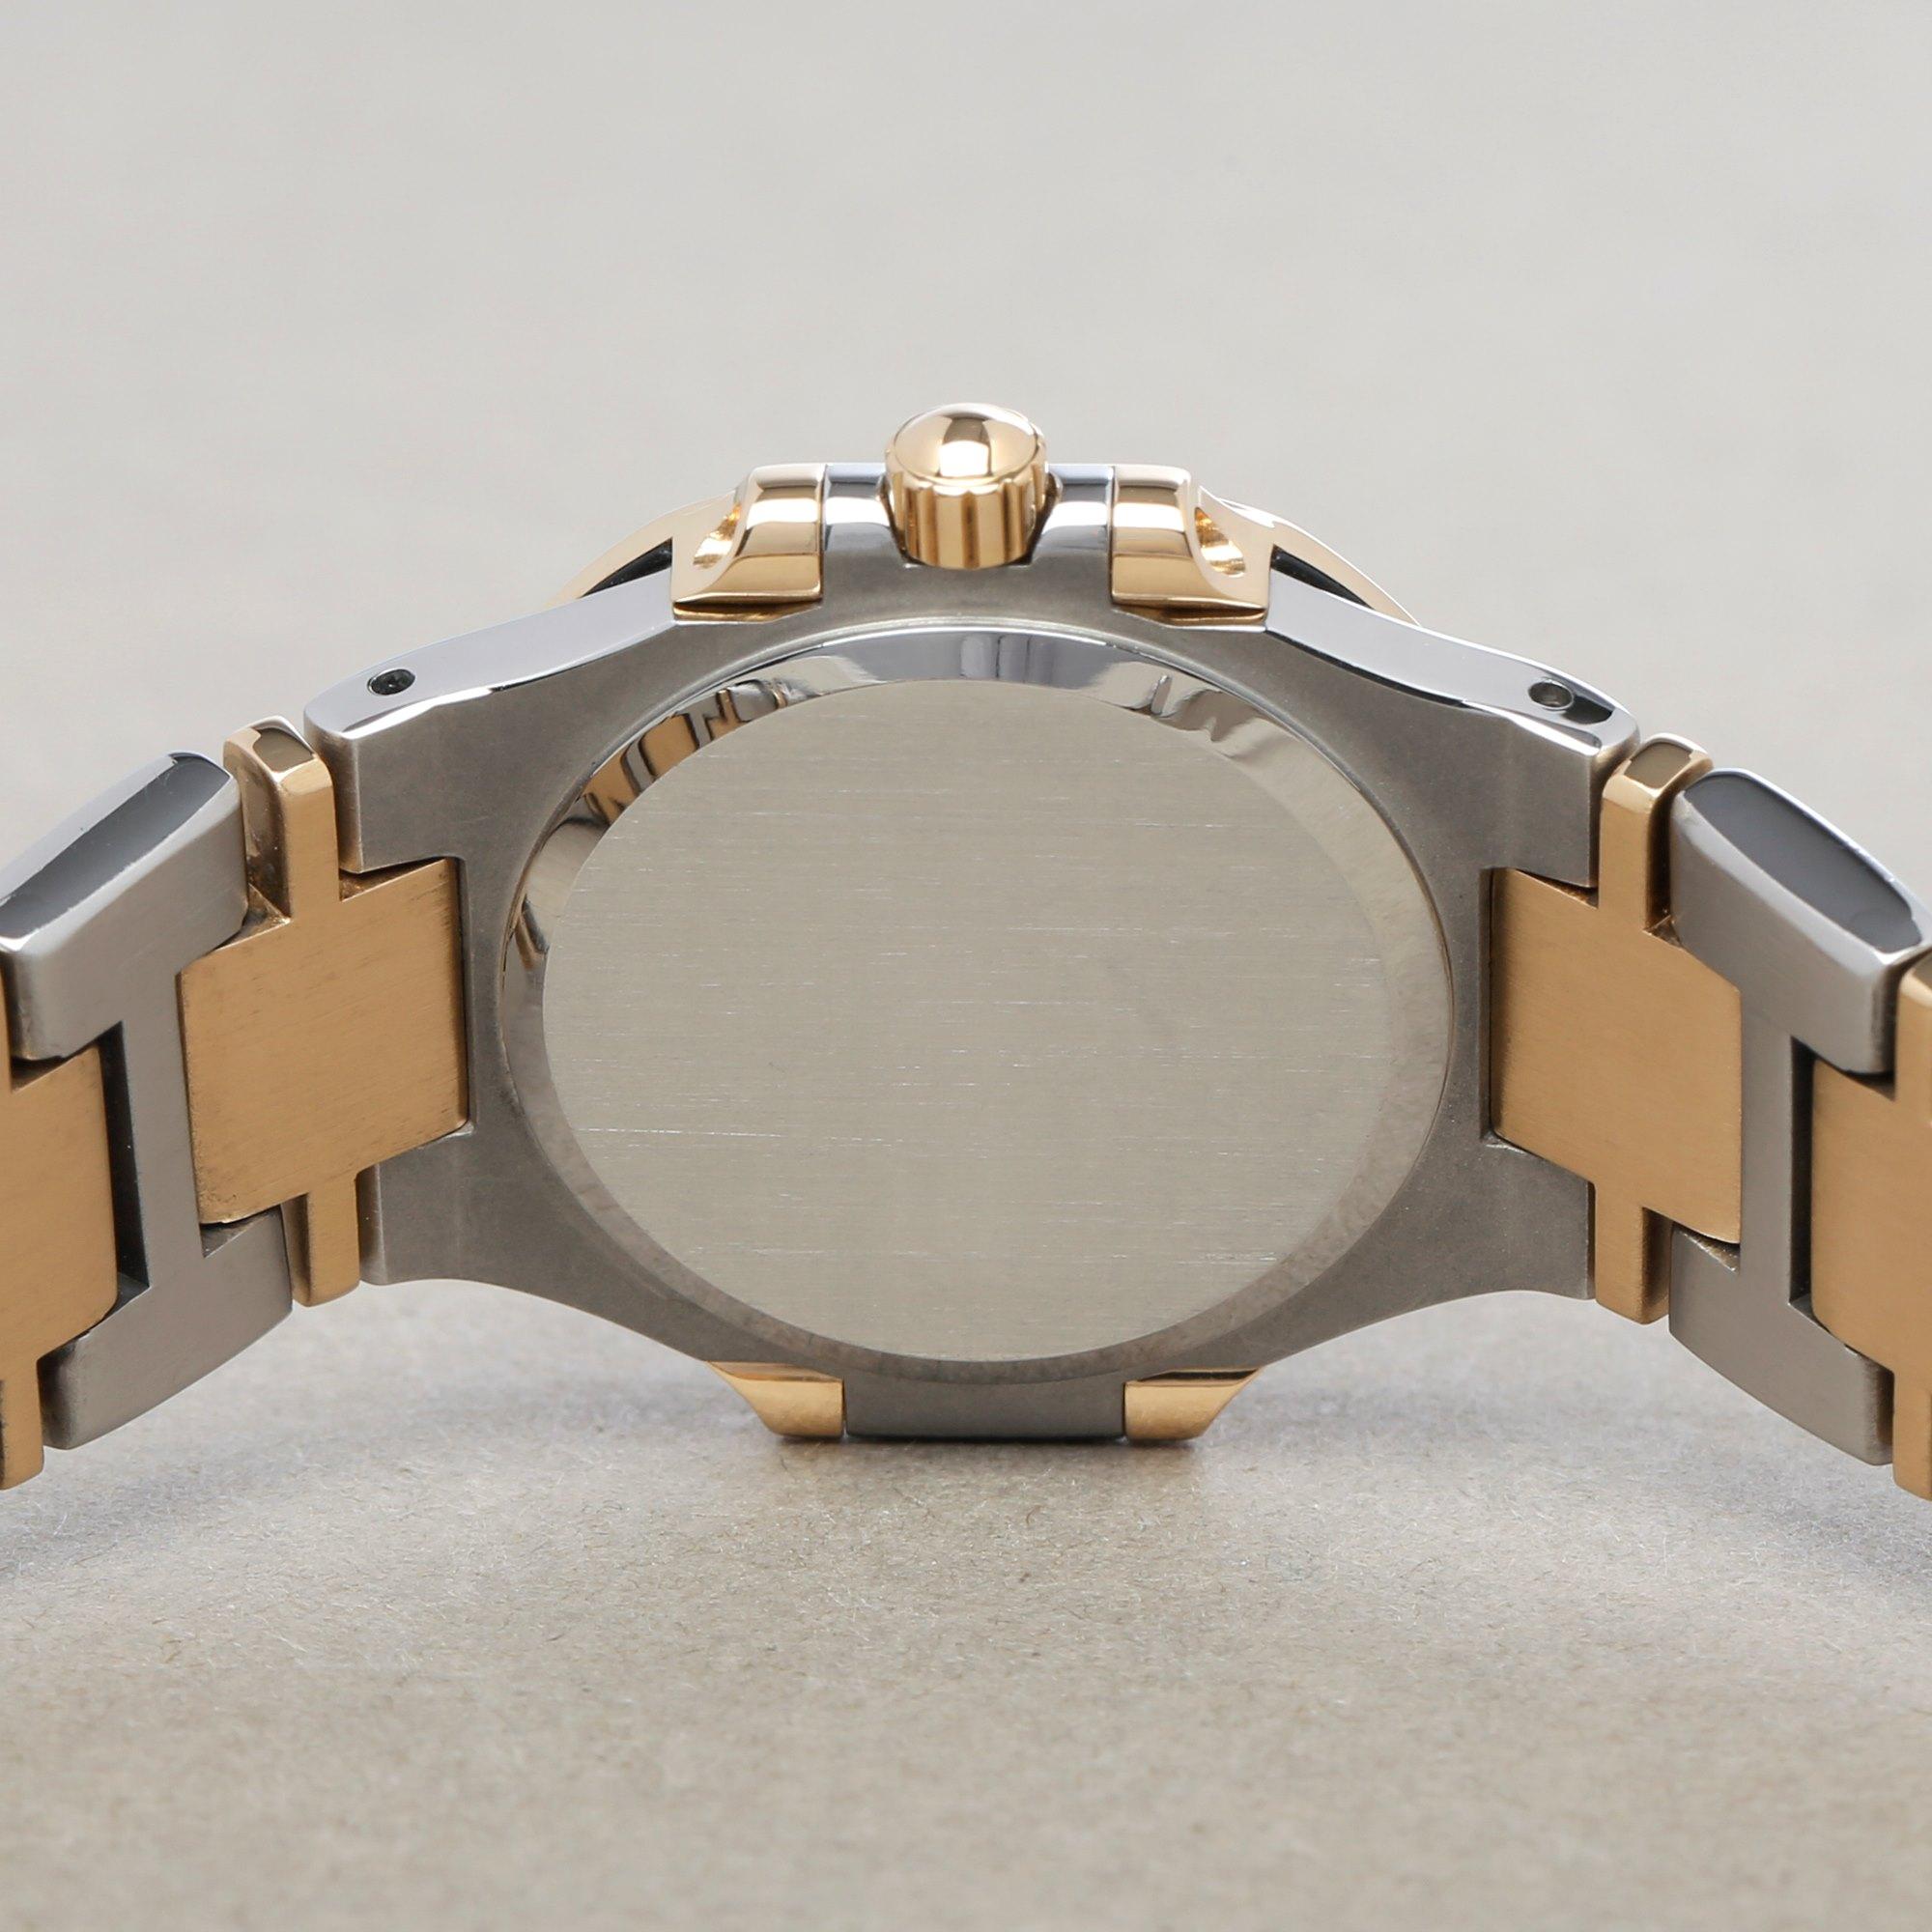 Patek Philippe Nautilus Lady 18K Yellow Gold & Stainless Steel 4700/061